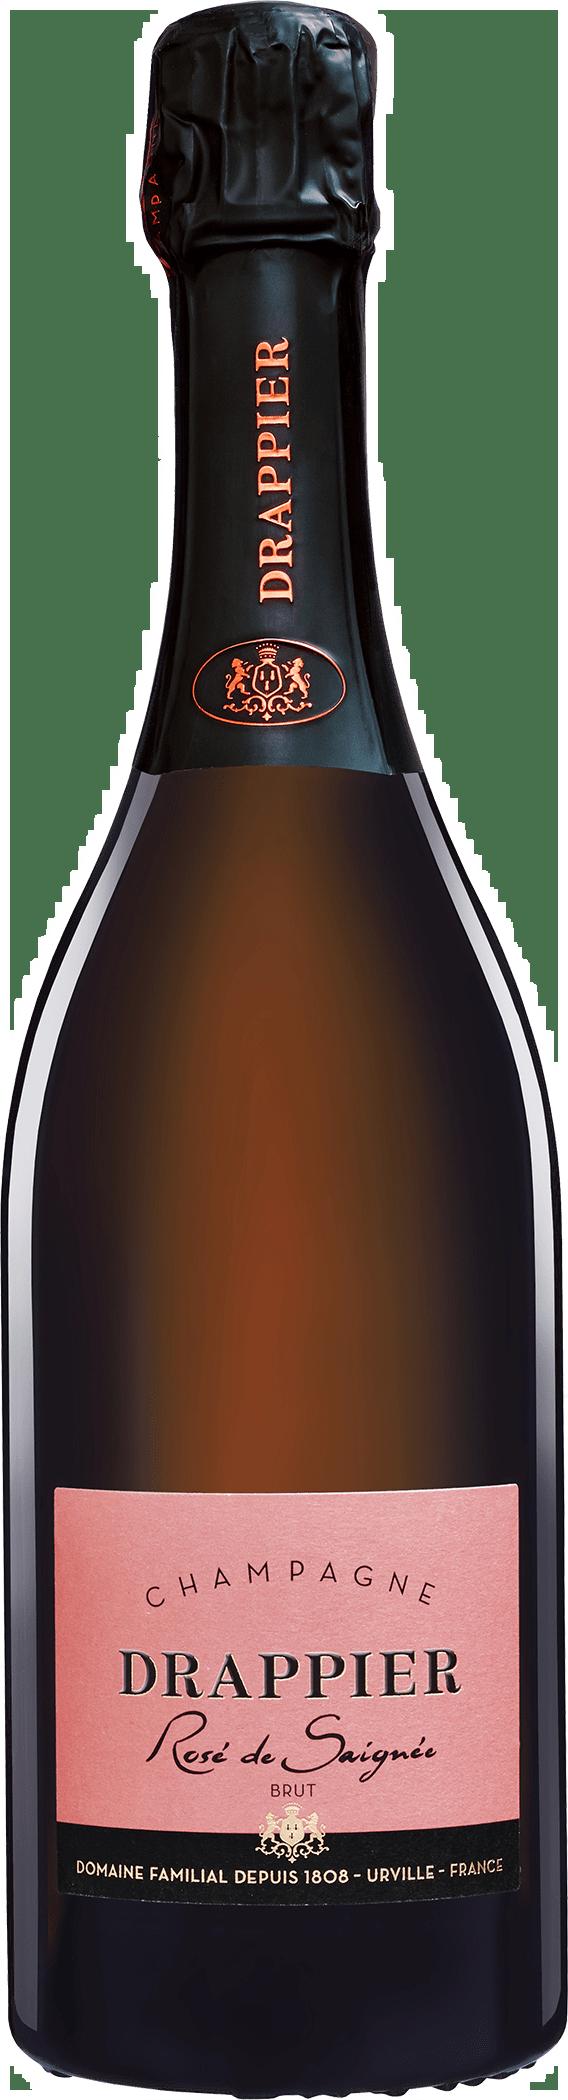 Champagne Drappier Rose de Saignee Brut